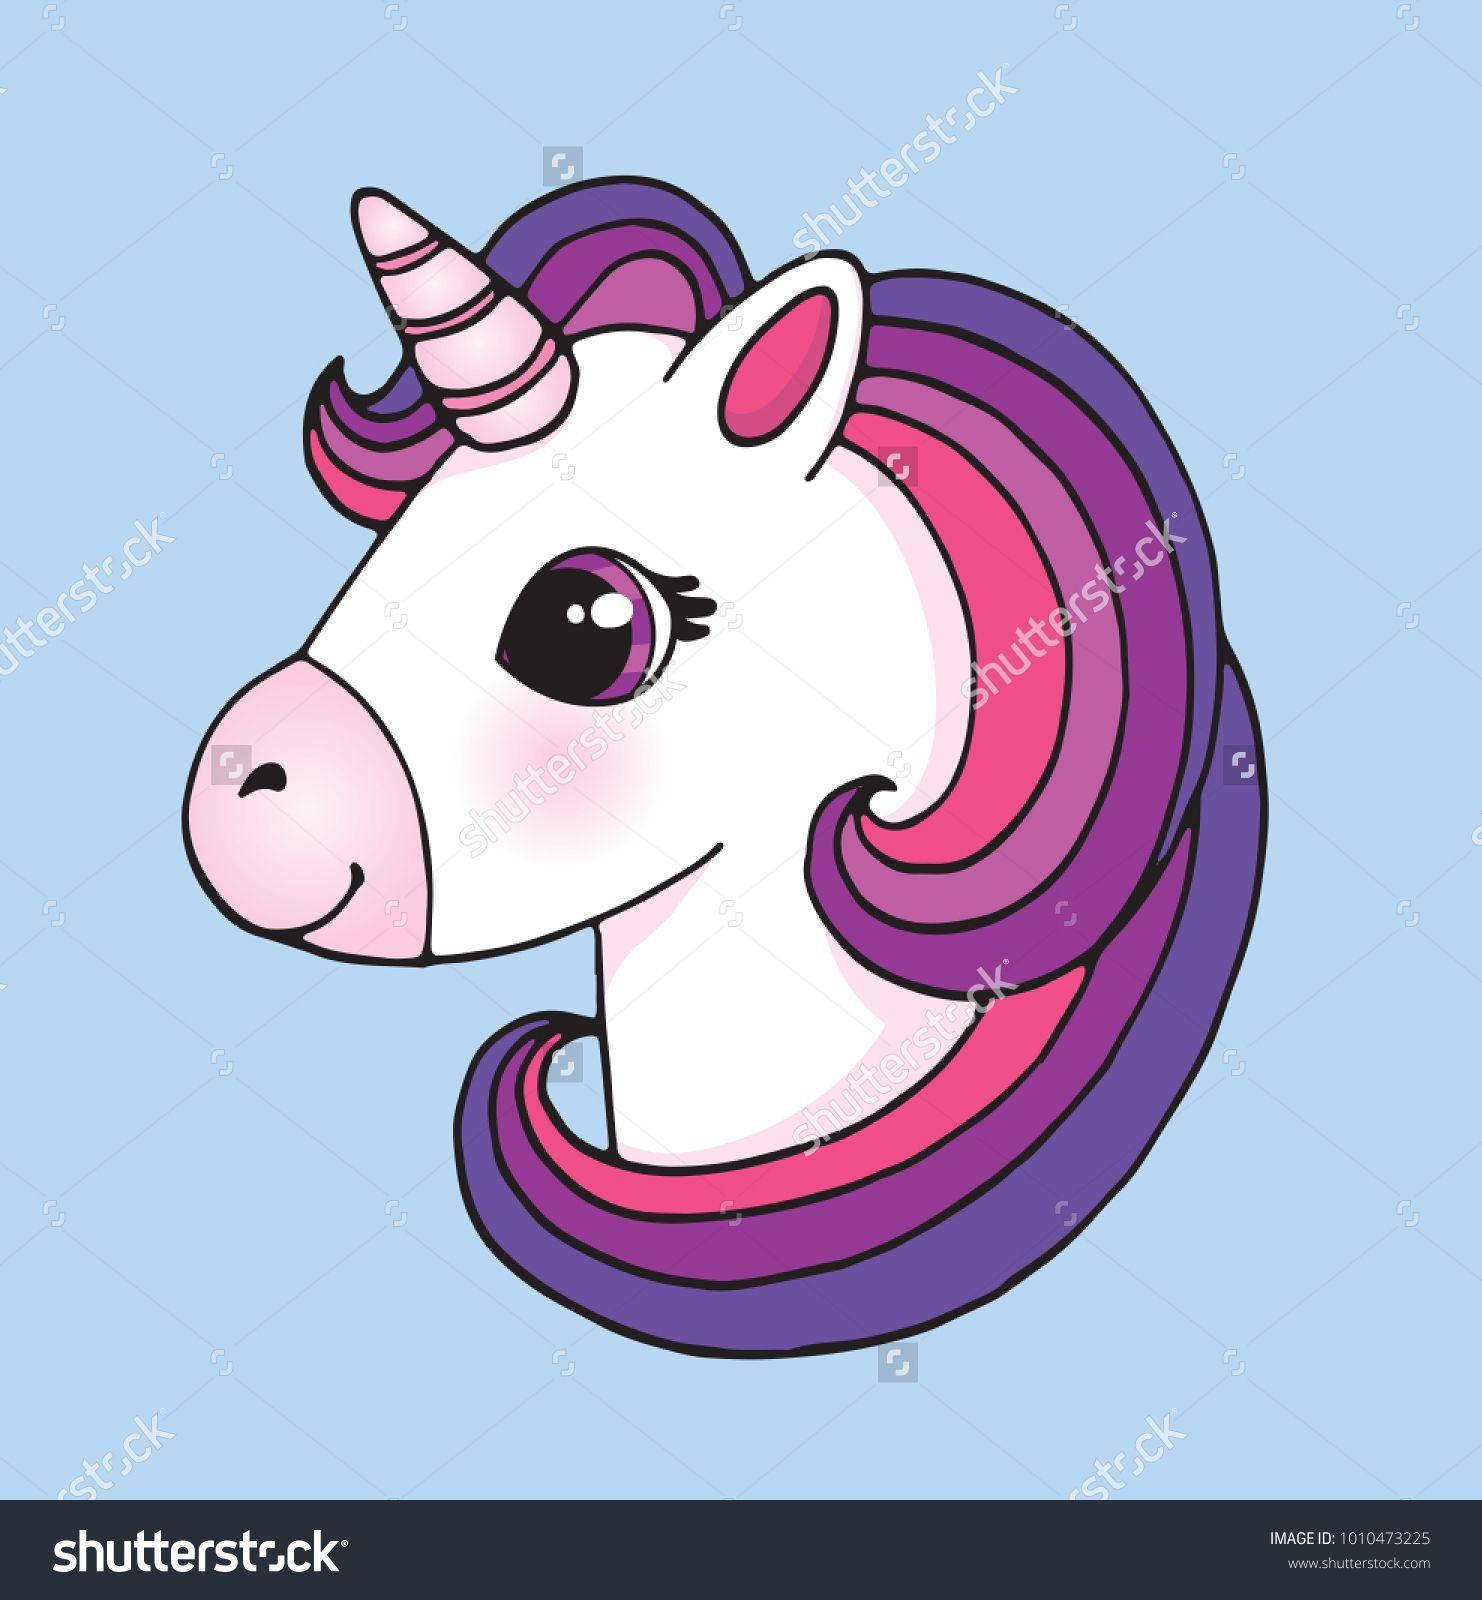 Cute cartoon unicorn head emoji vector illustration